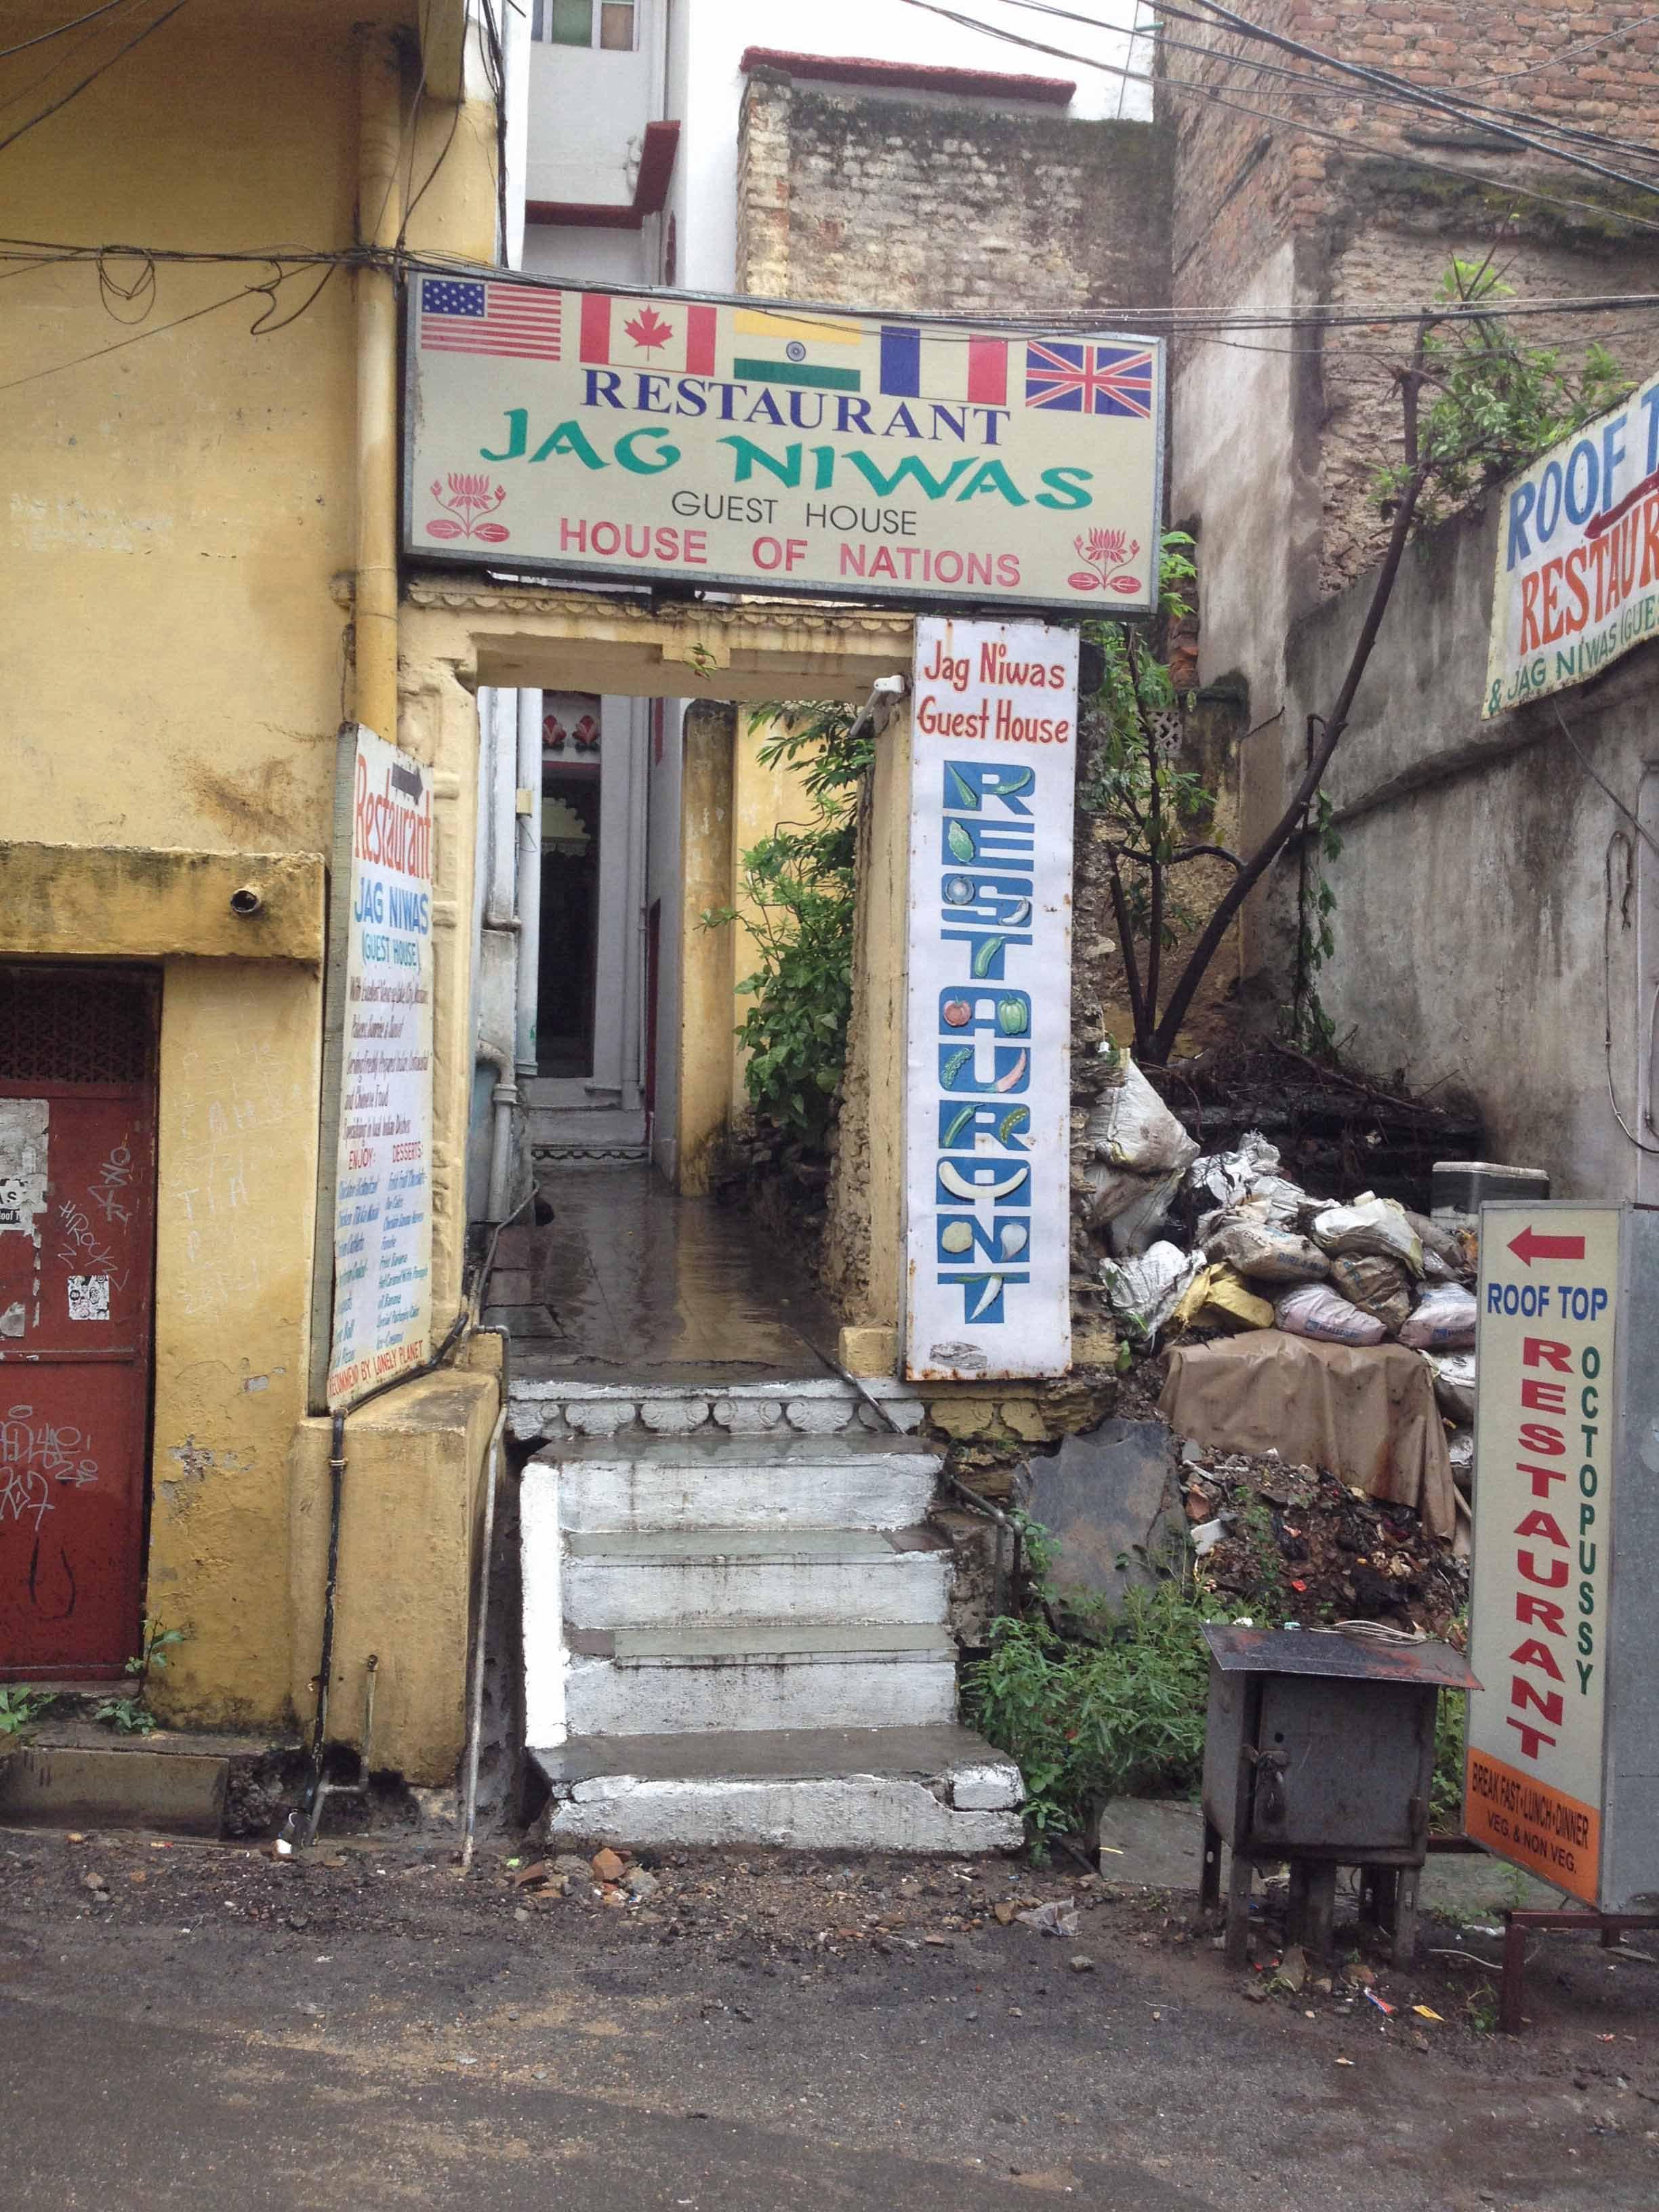 Jag Niwas Rooftop Restaurant - Chandpole - Udaipur Image